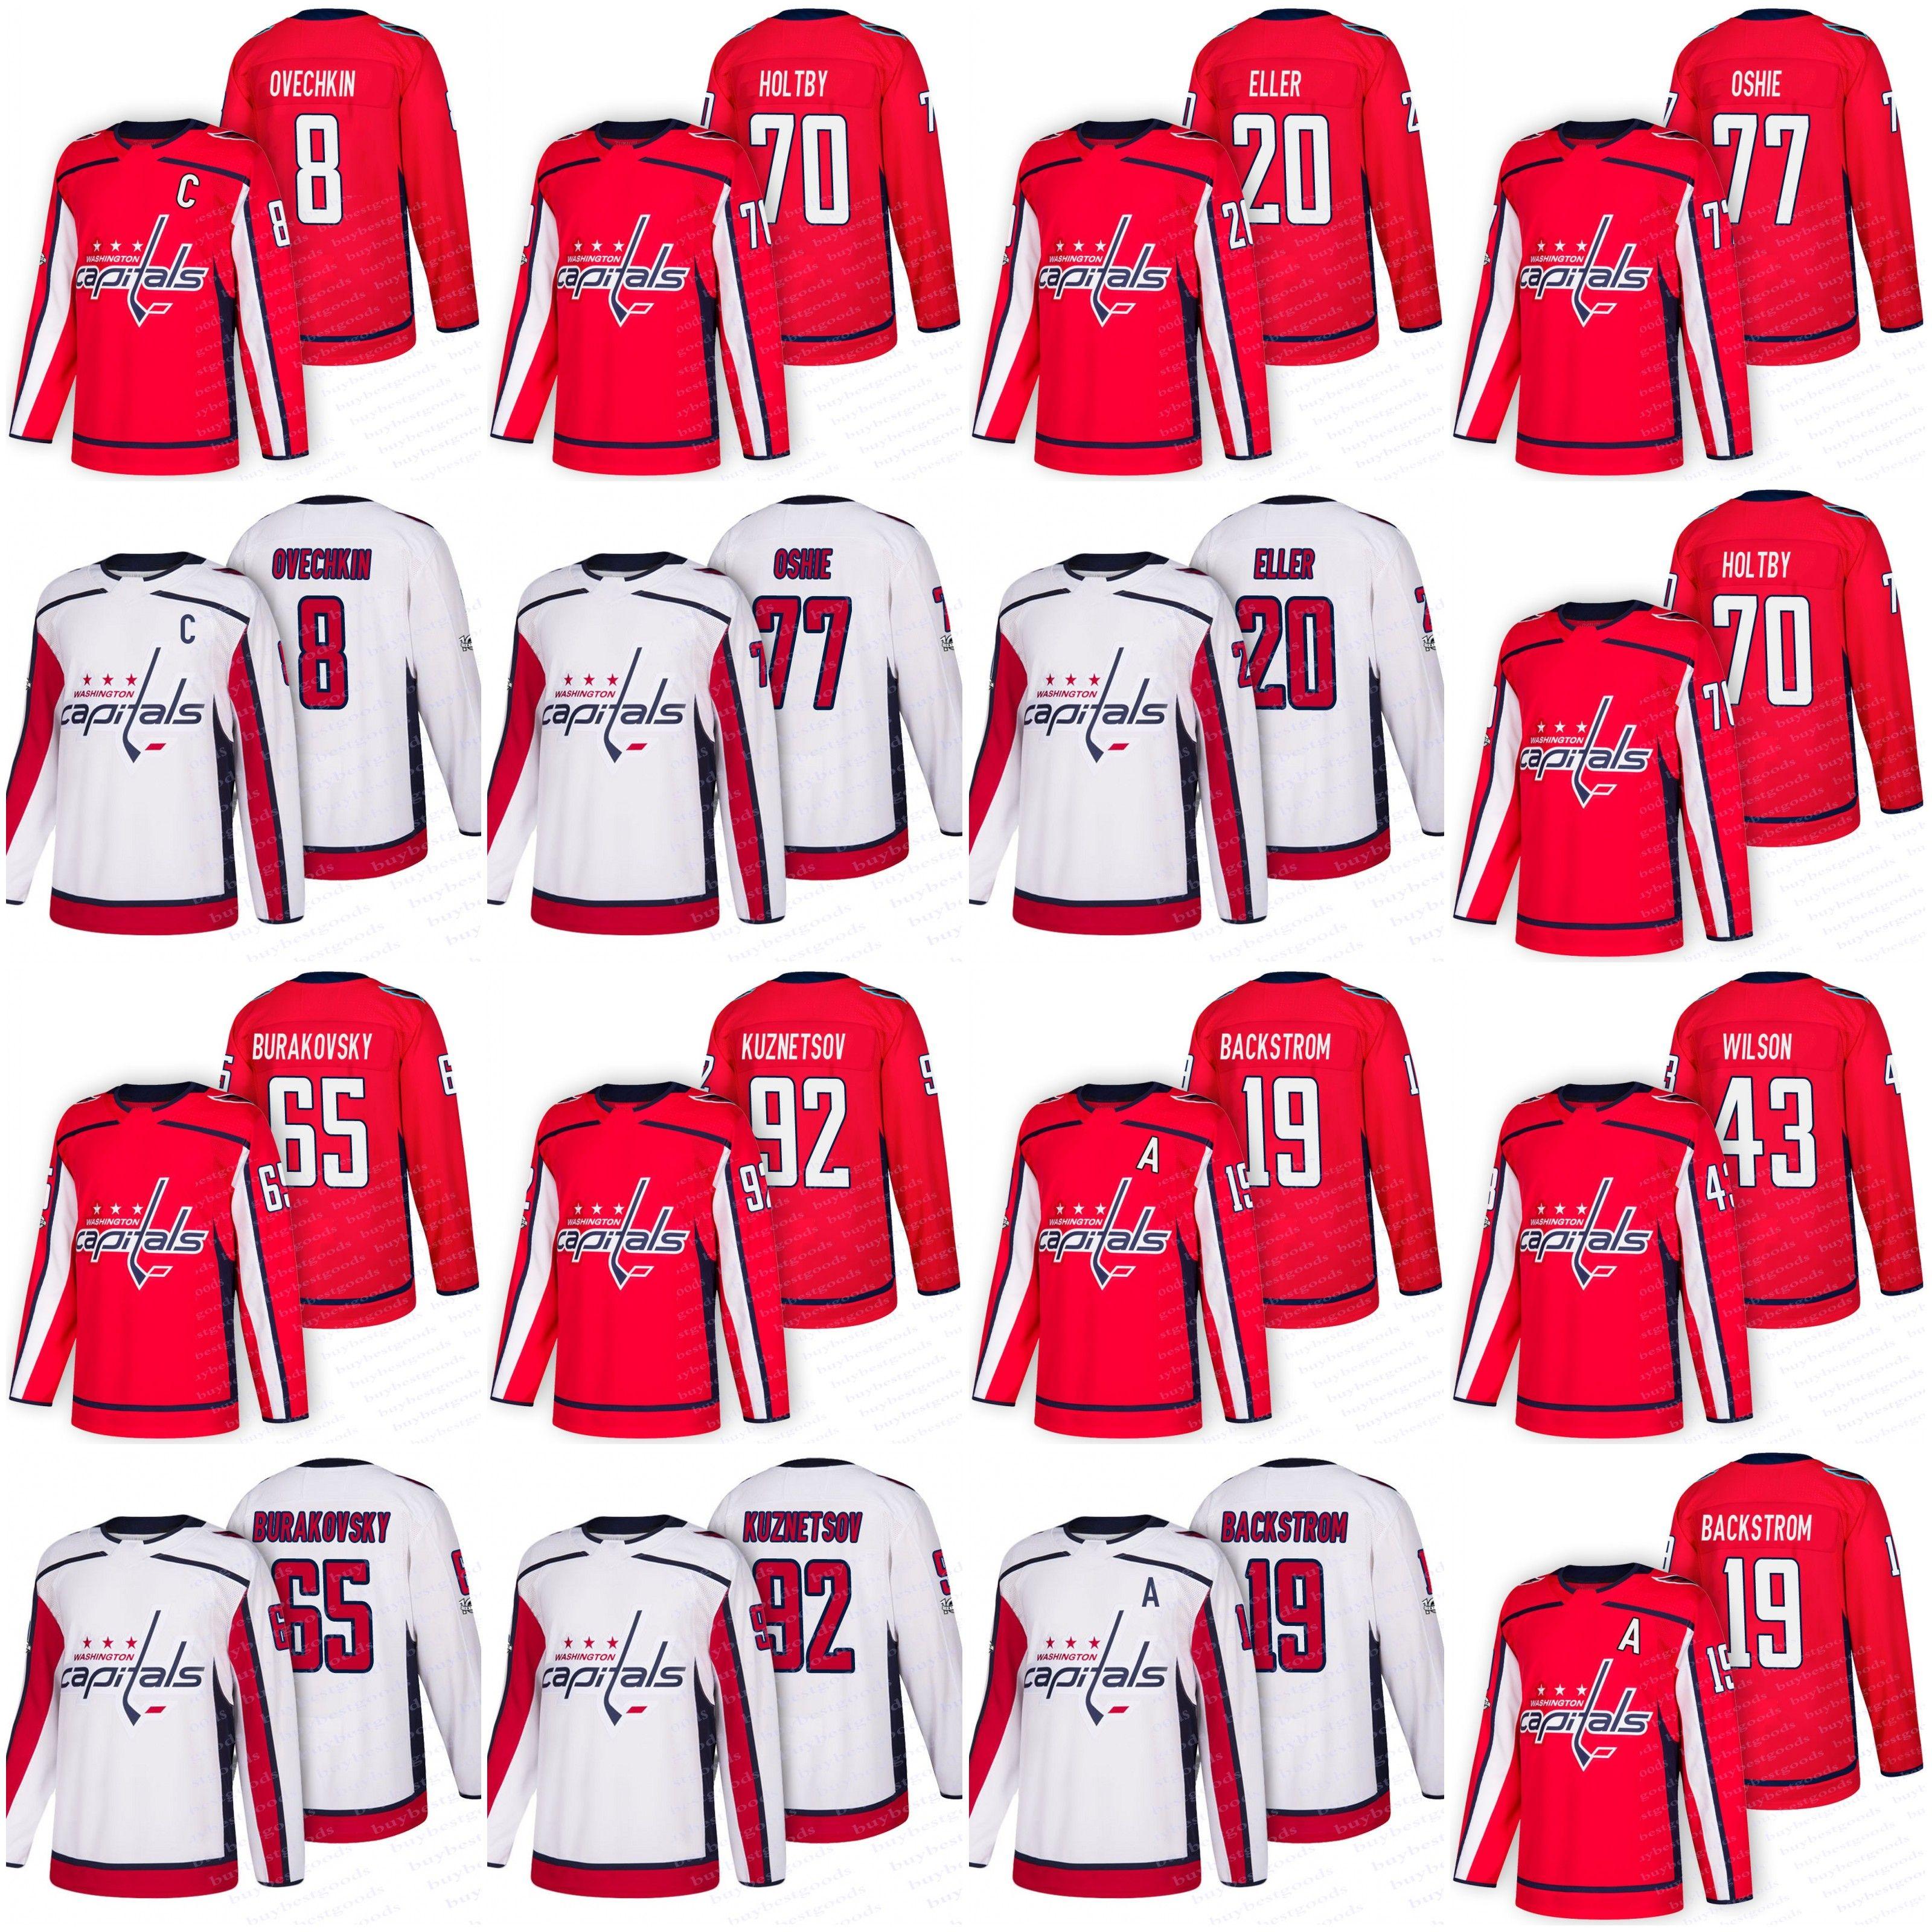 ... order discount 2018 washington capitals hockey jerseys 77 t.j. oshie 92  evgeny kuznetsov 8 alex ovechkin 43a6f7cdf